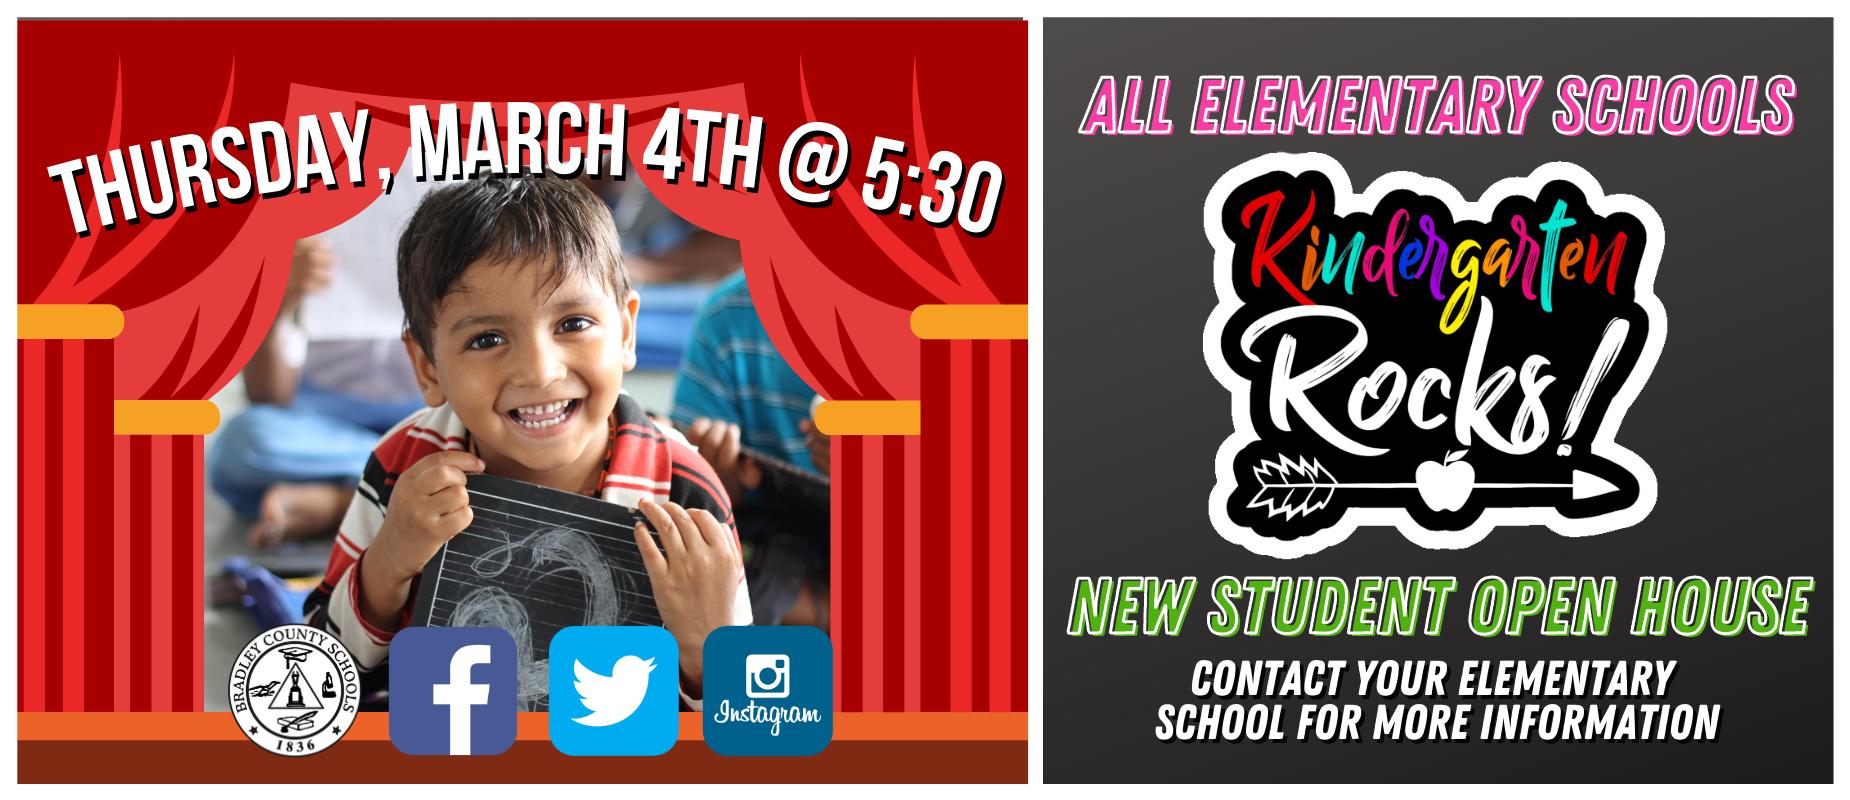 Kindergarten Rocks - March 4, 2021